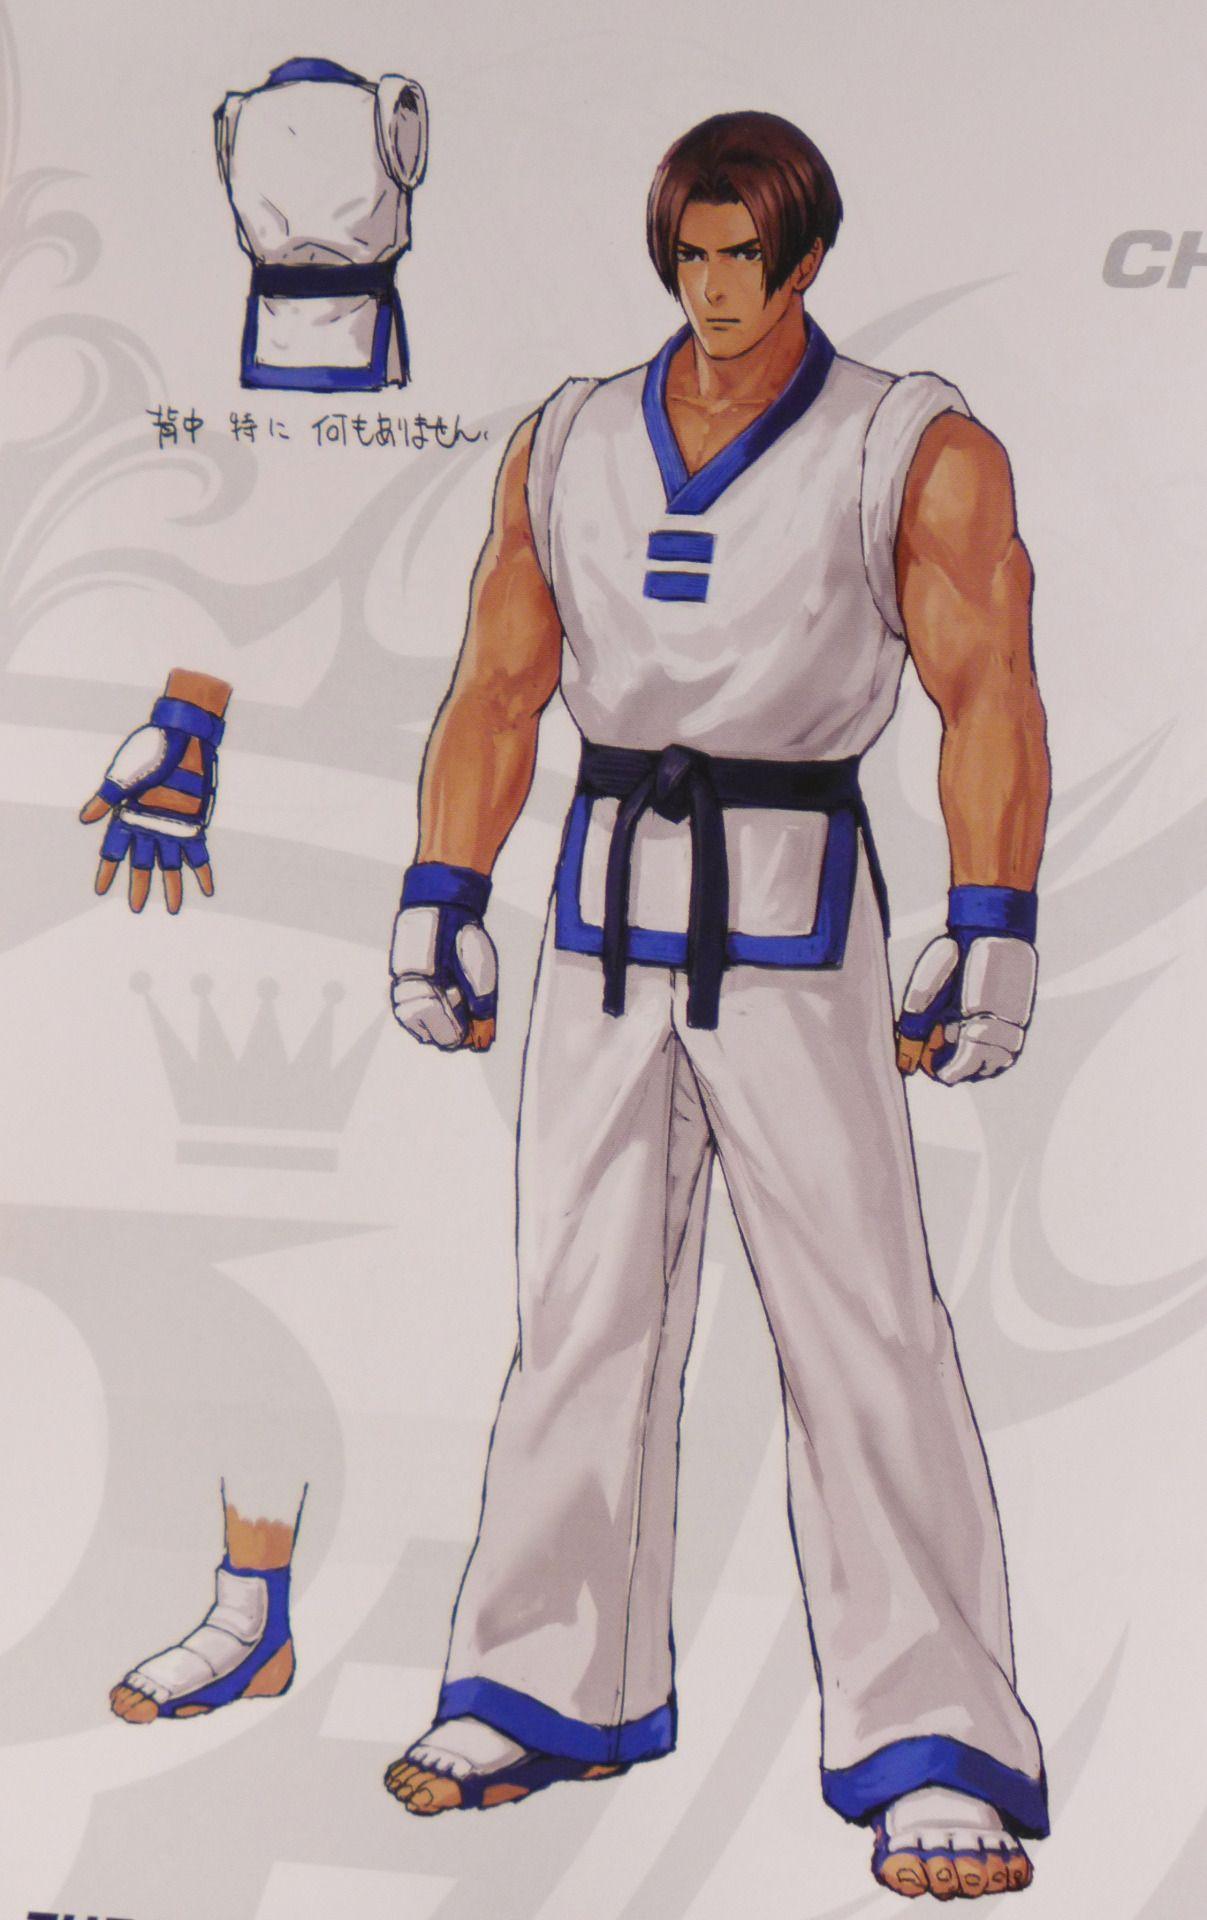 kim kaphwan kof xiv artbook king of fighters fighter street fighter pinterest